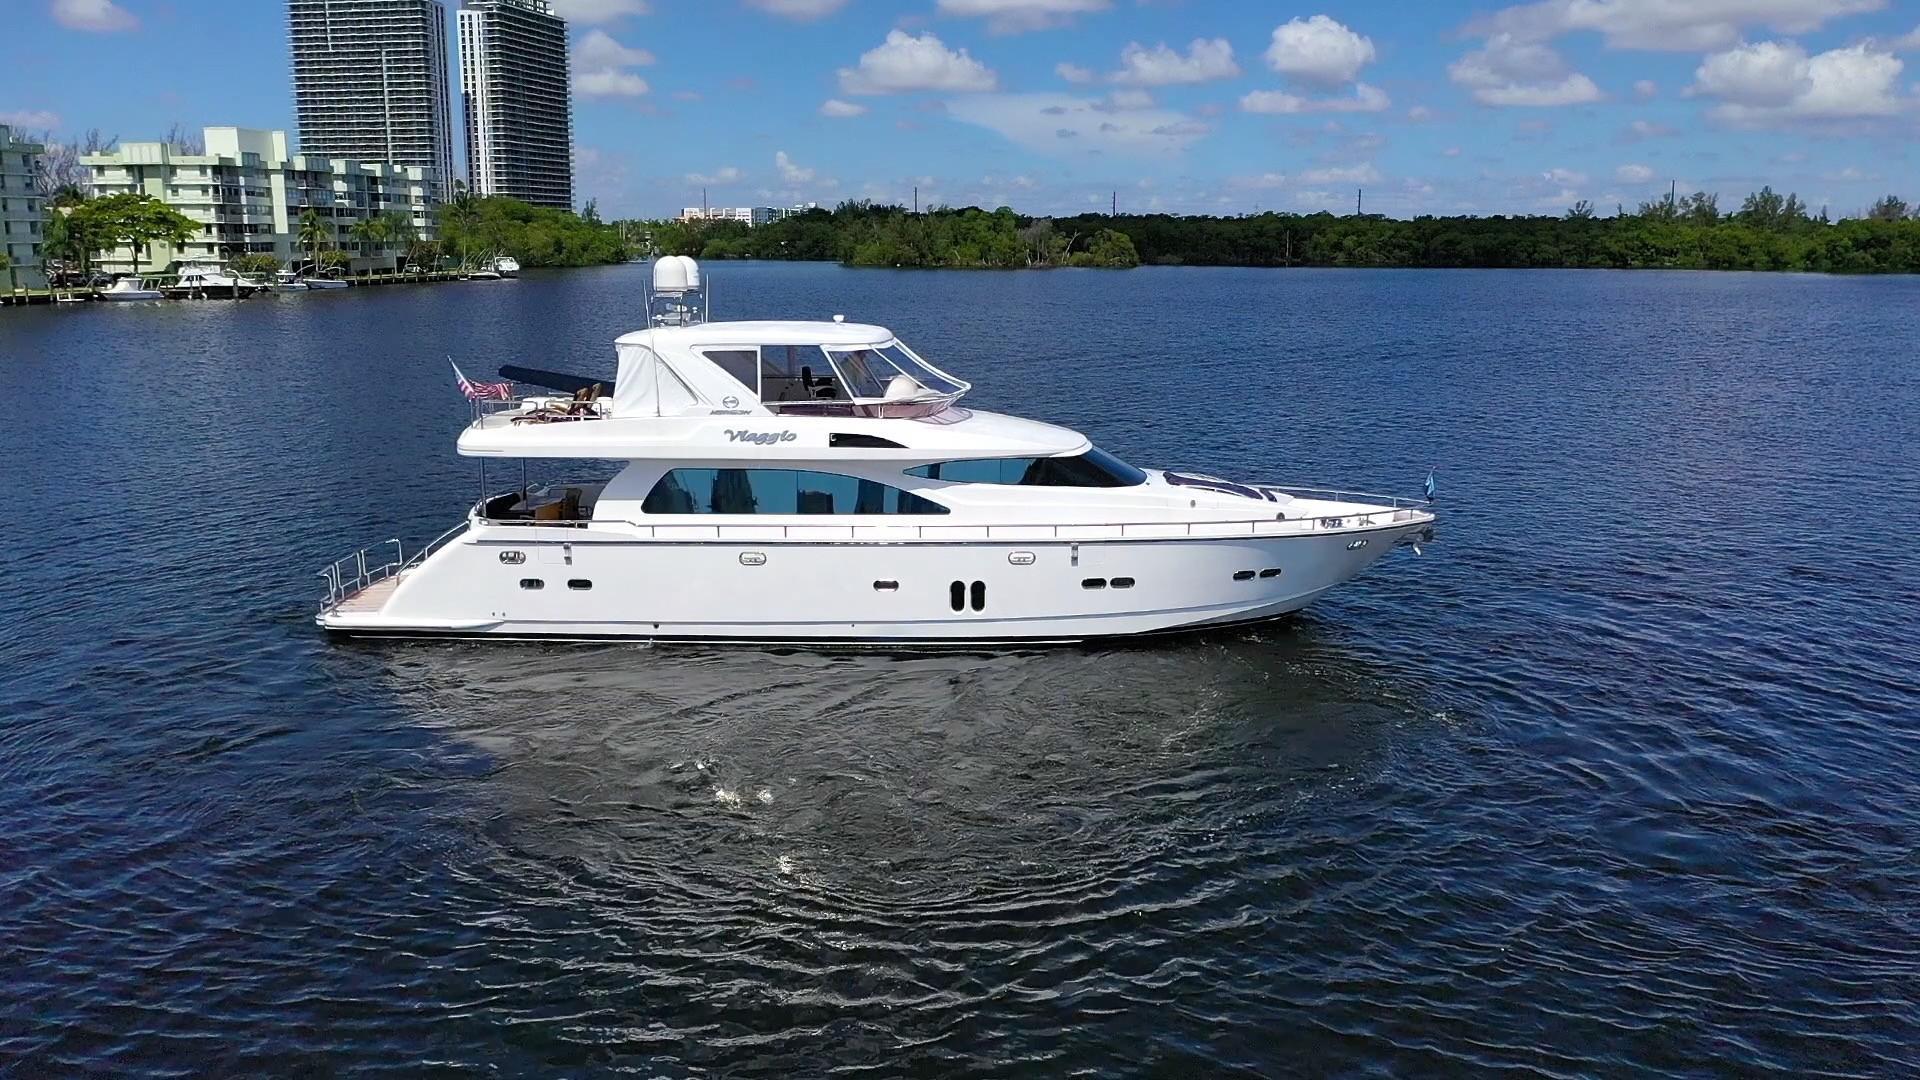 74' Horizon Motor Yacht VIAGGIO